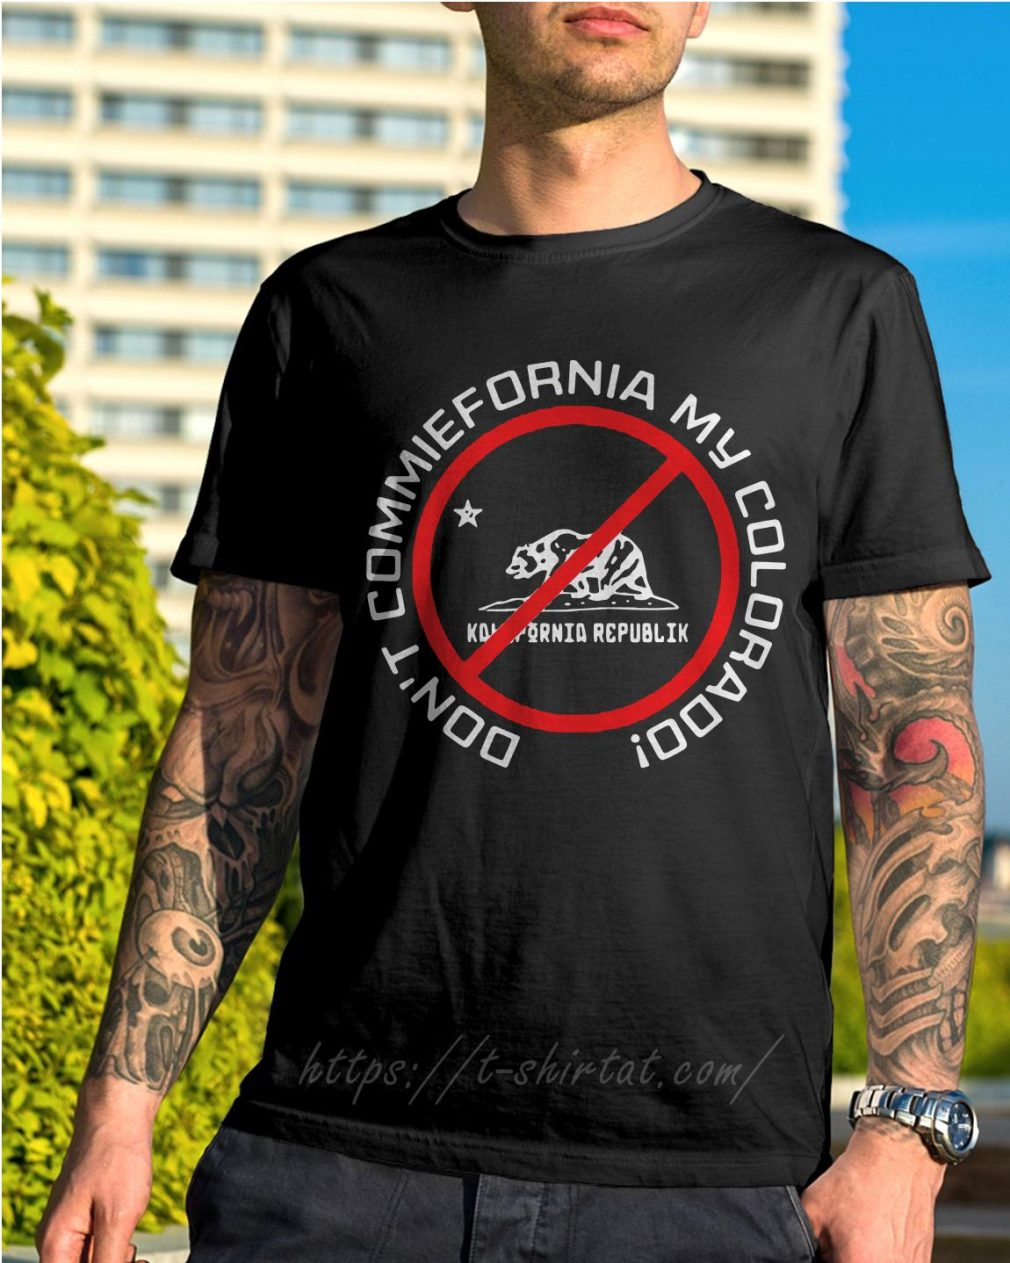 Bear Don't commiefornia my colorado republik shirt